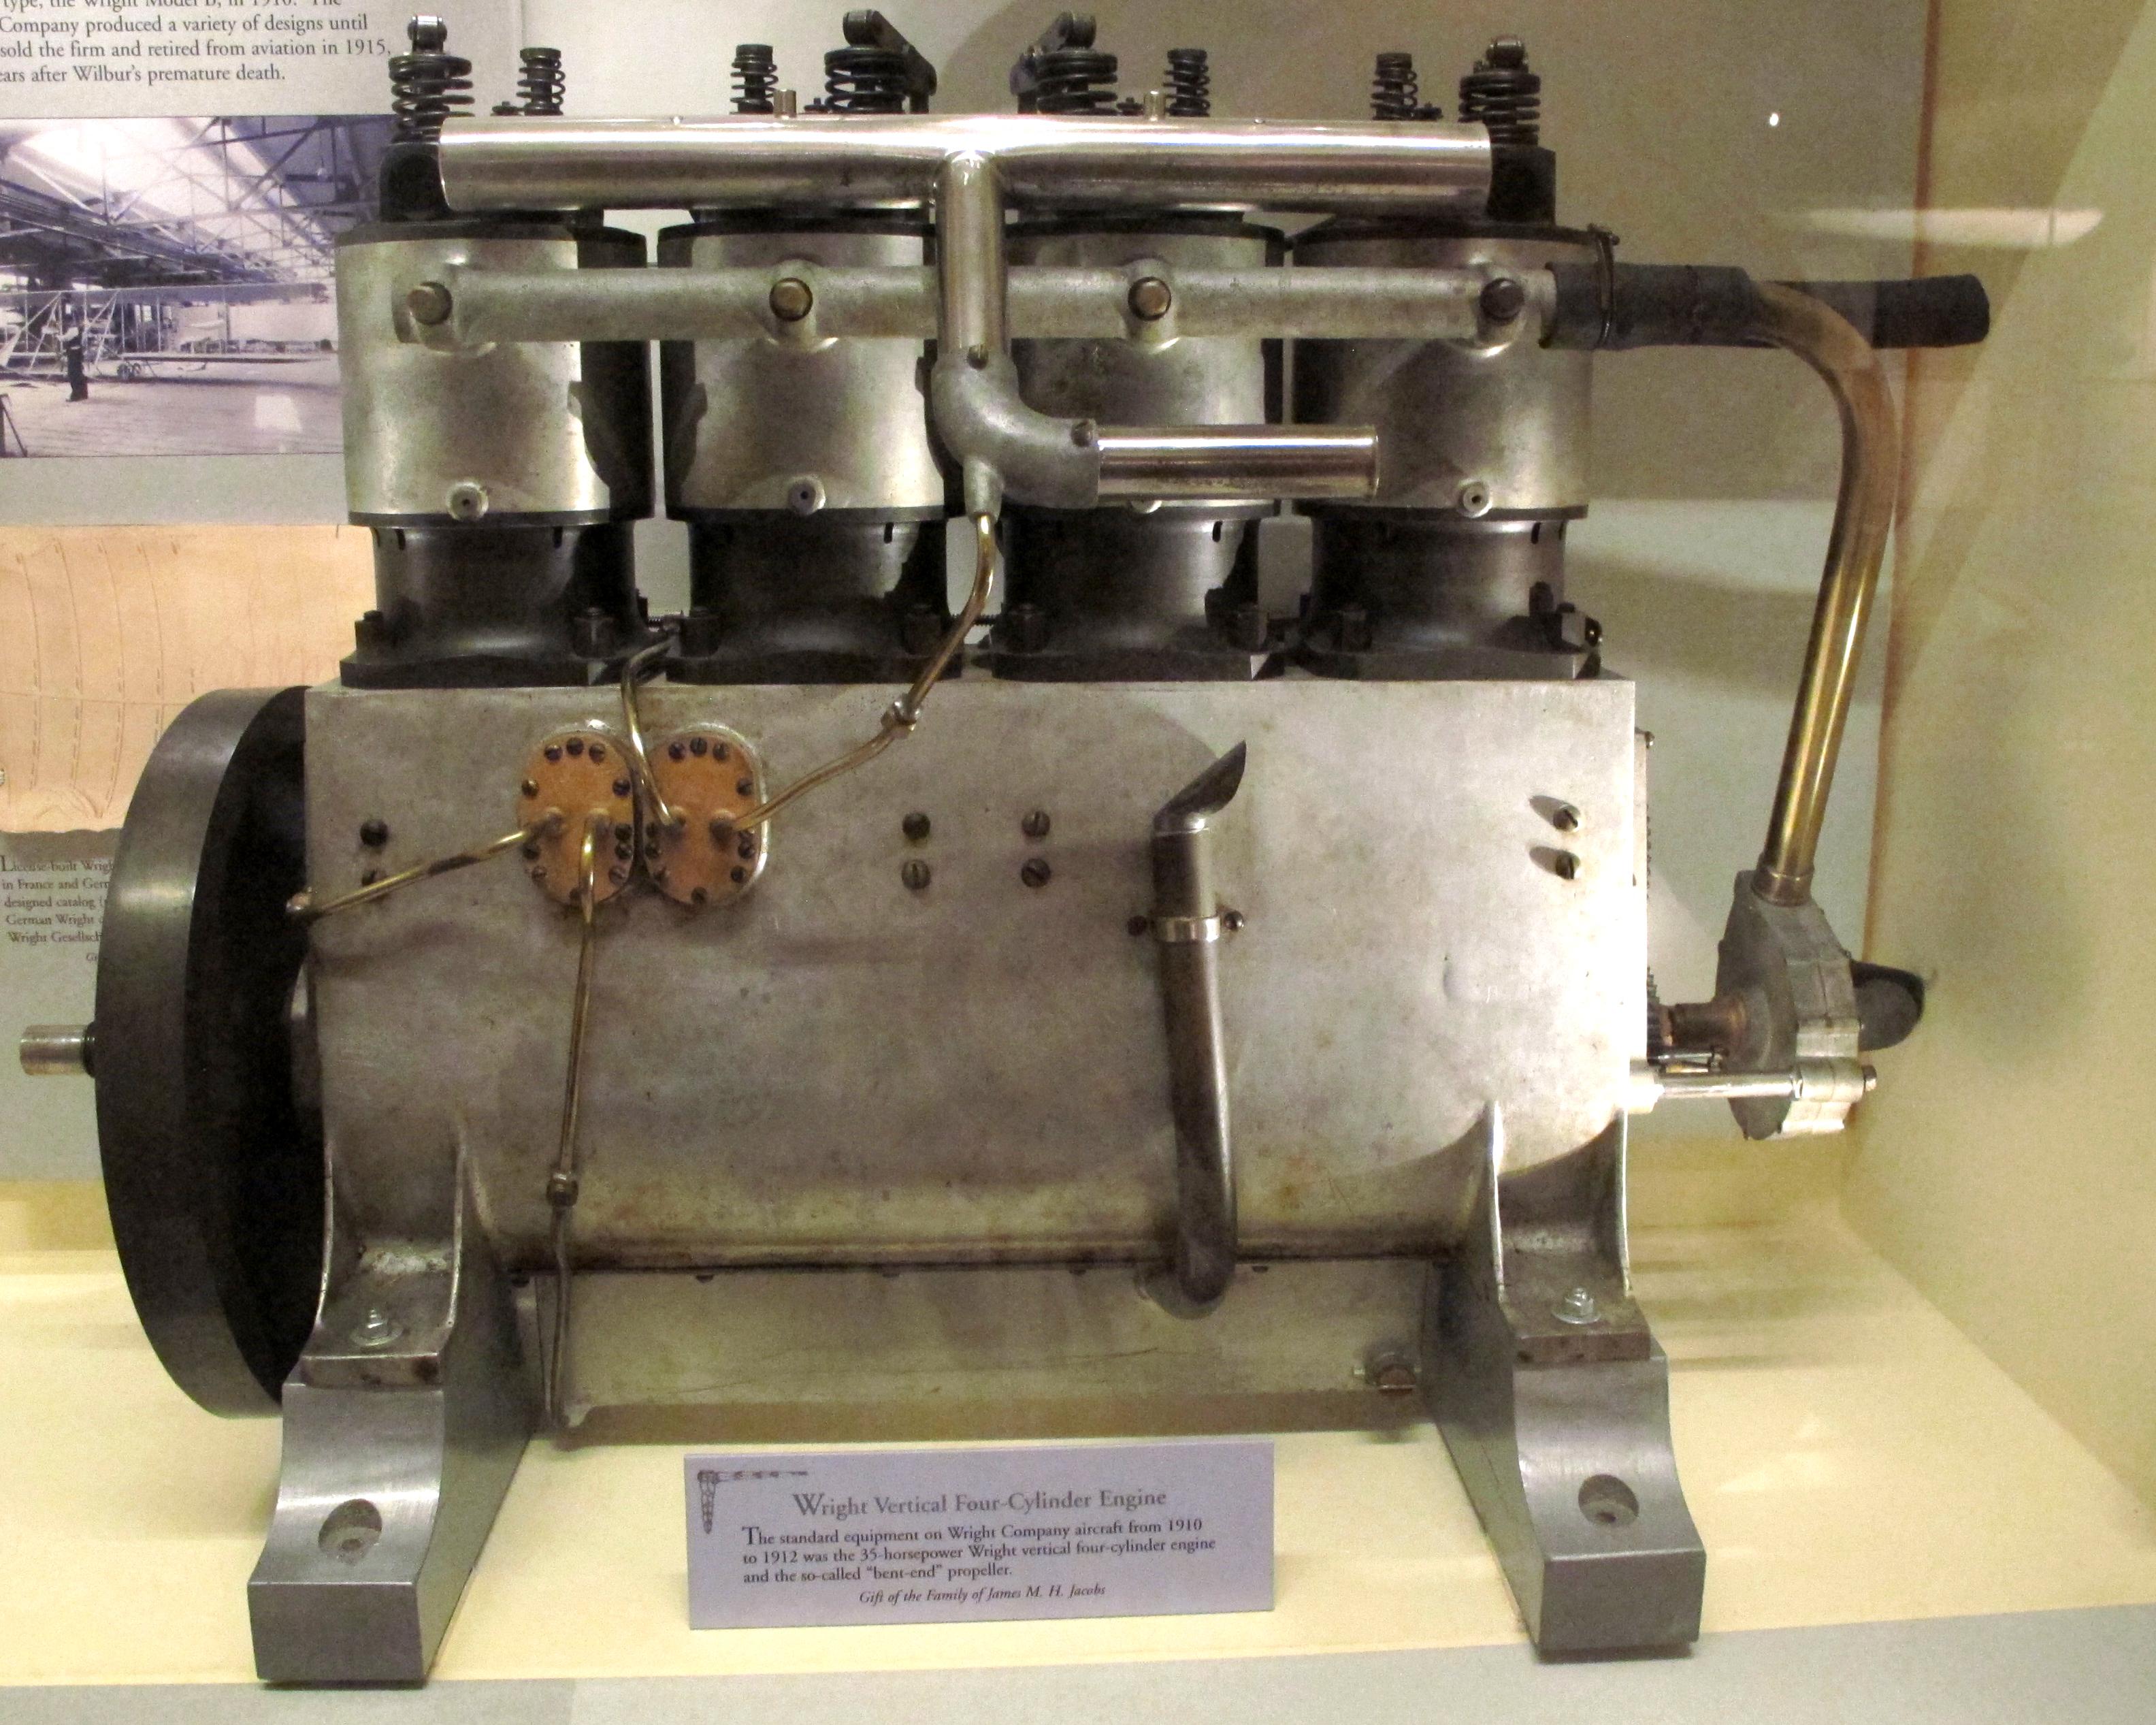 File:Wright Vertical Four-Cylinder Engine jpg - Wikimedia